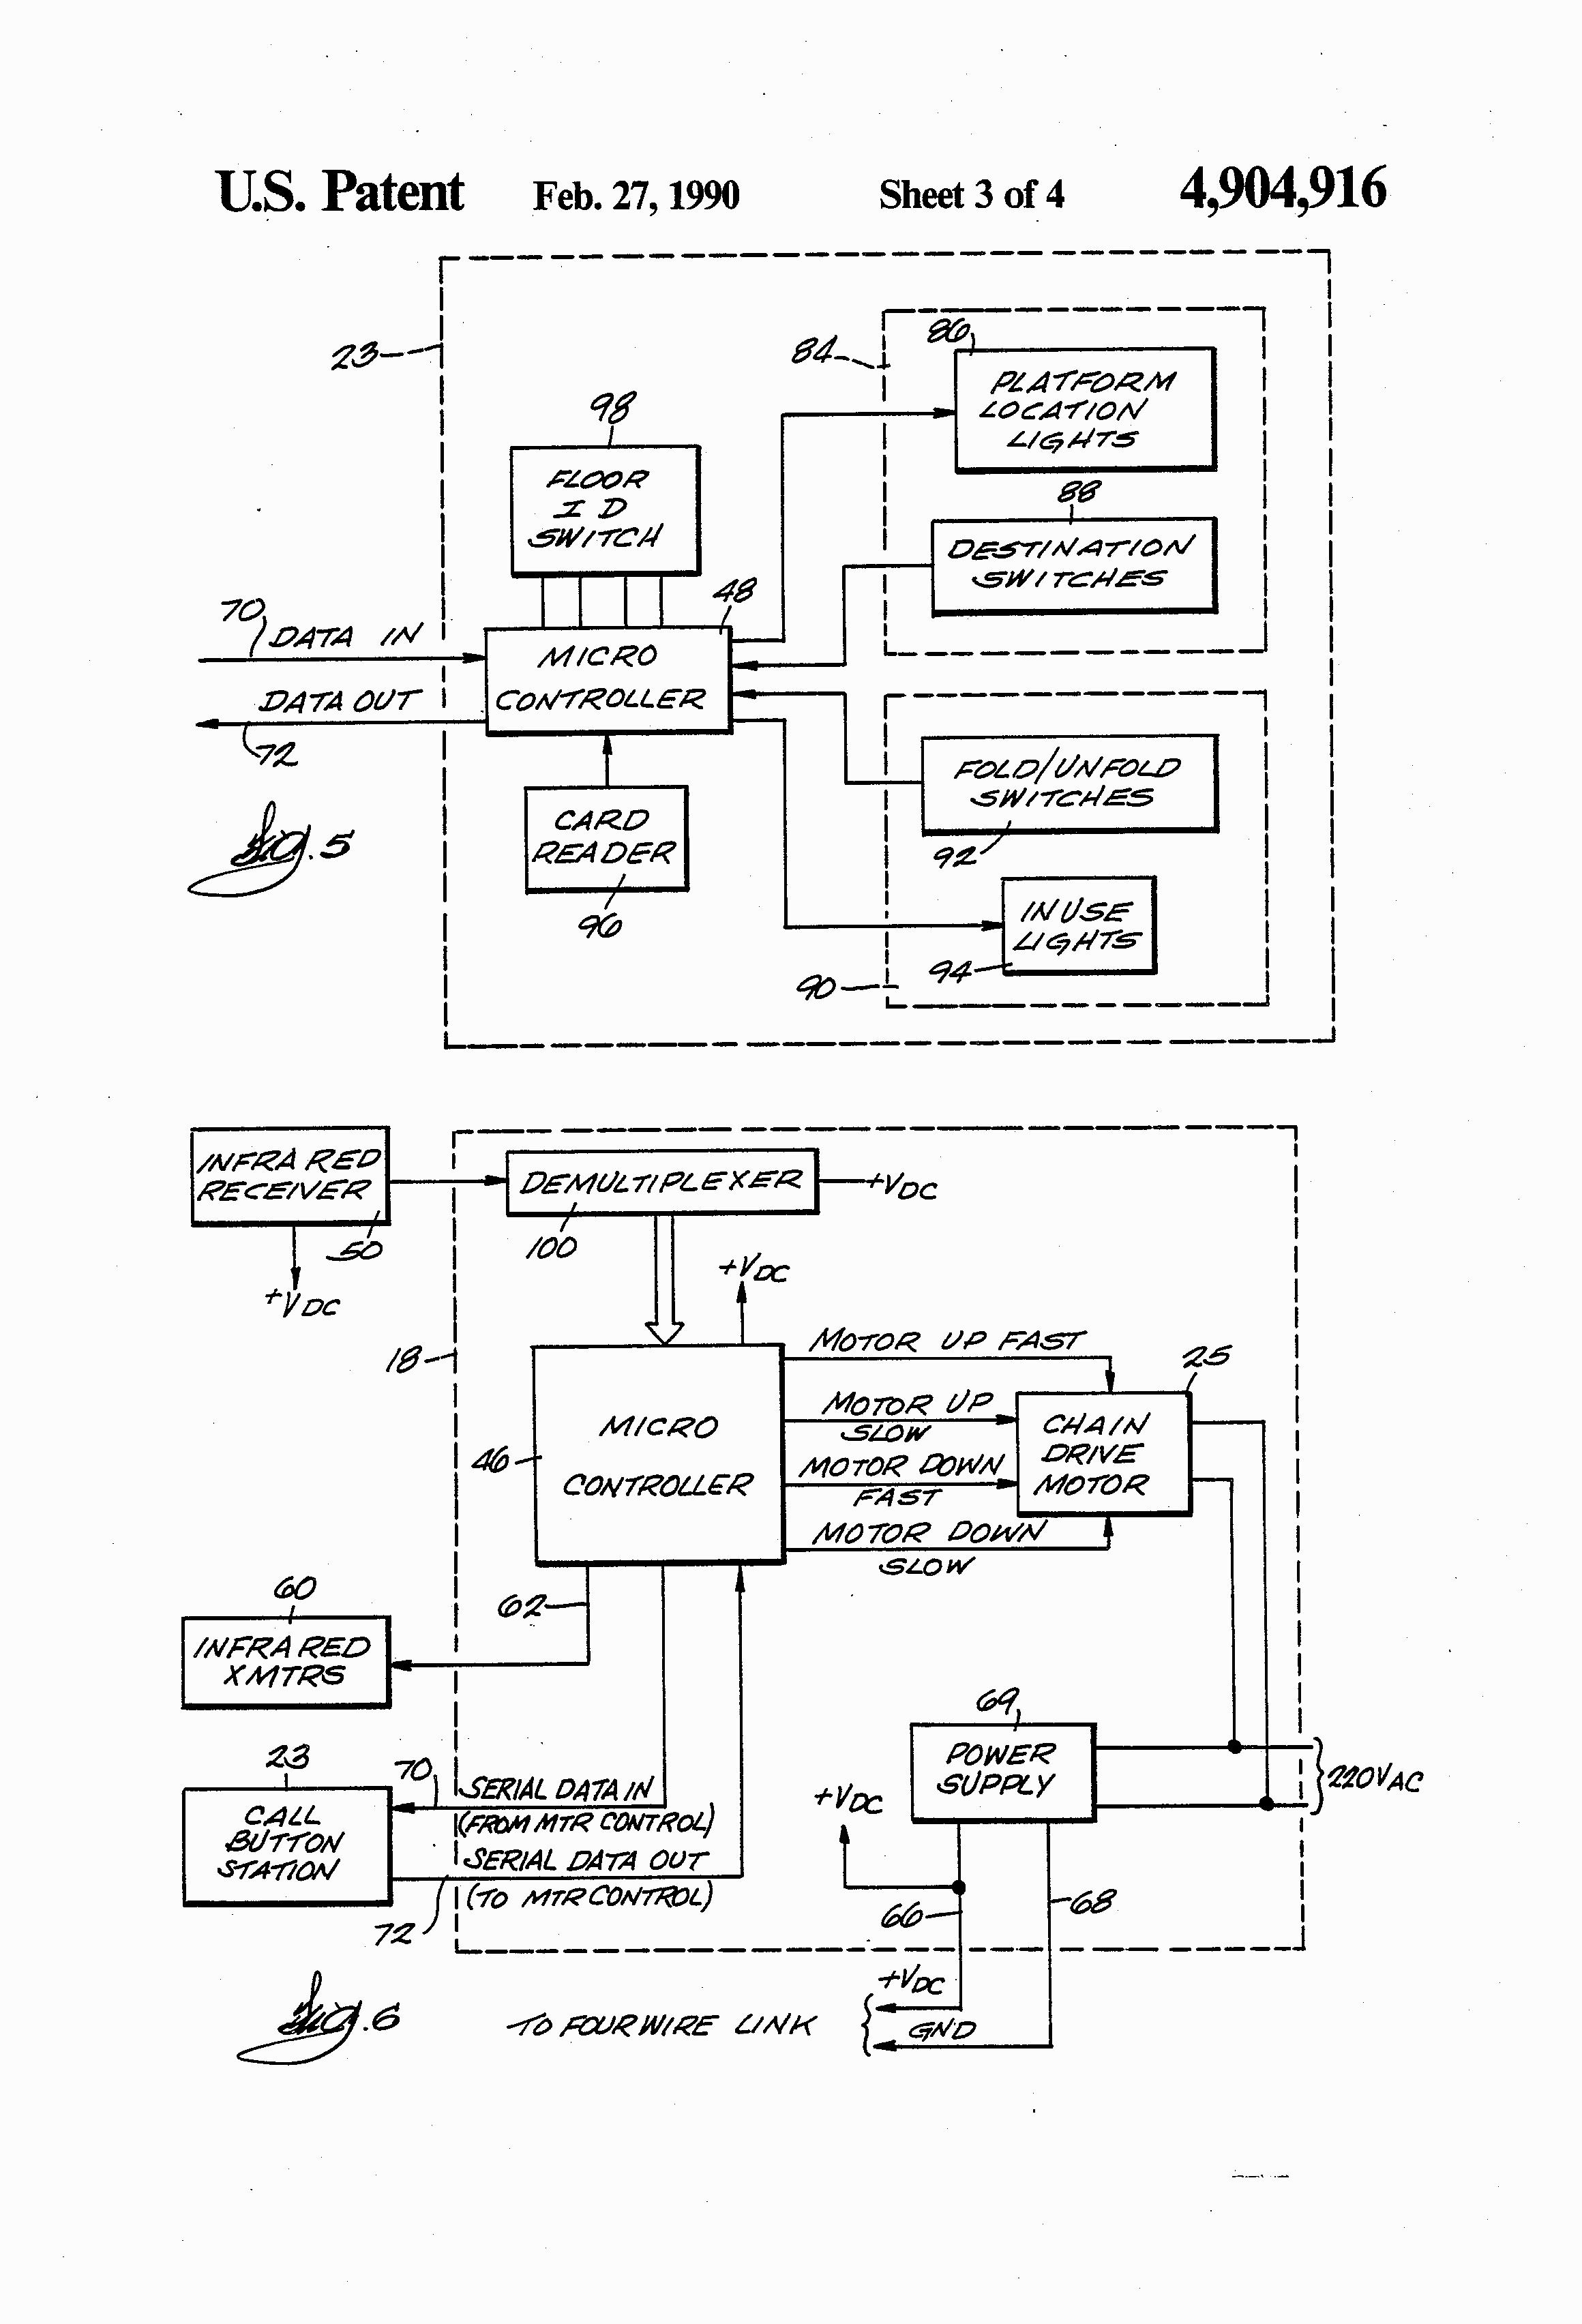 Stair Glide Wiring Diagram List Of Schematic Circuit Diagram \\u2022 Logan Wiring  Diagram Bruno